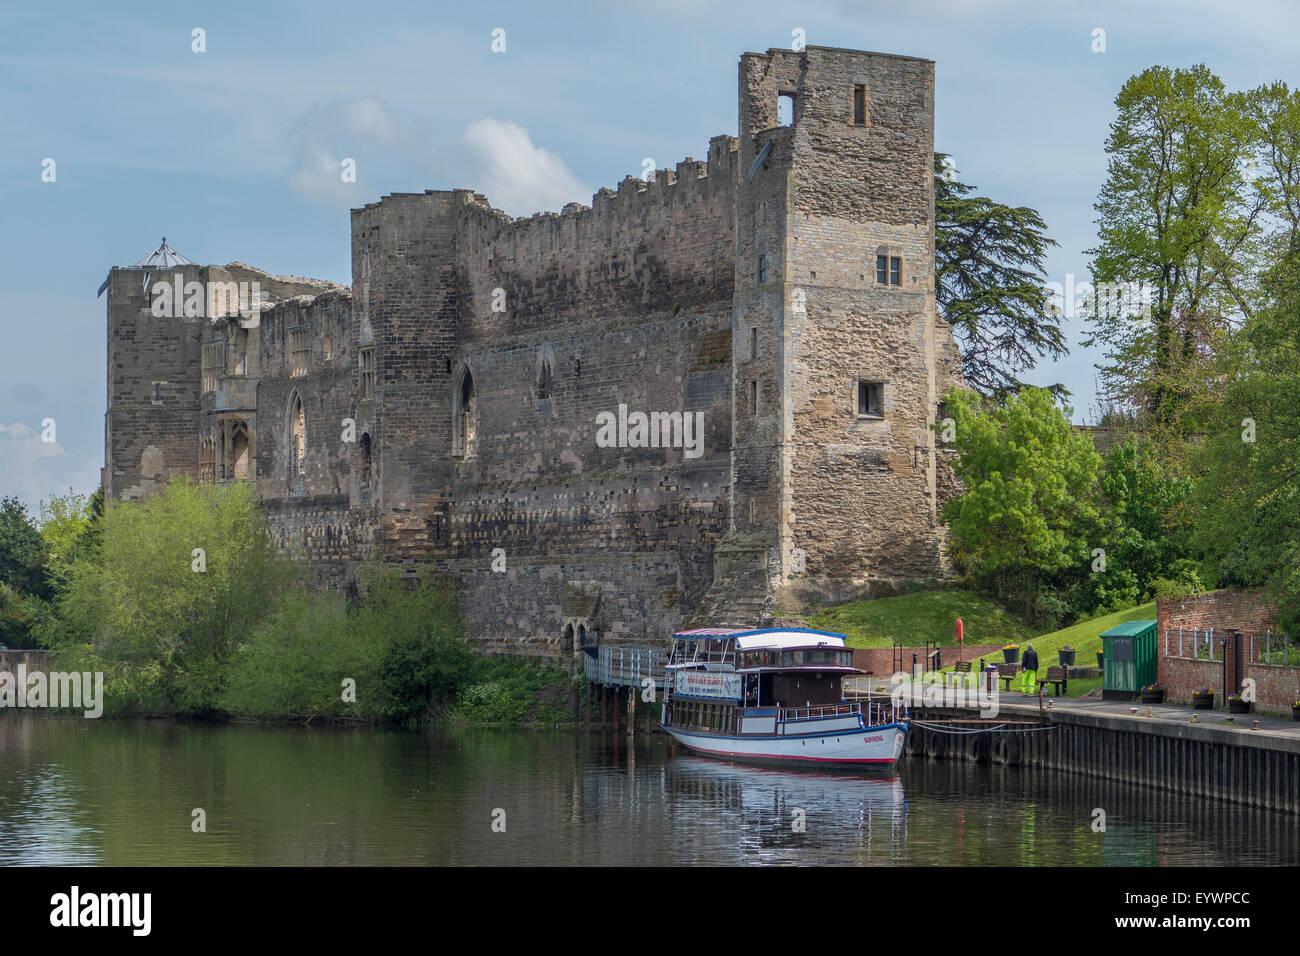 Castle and River Trent, Newark, Nottinghamshire, England, United Kingdom, Europe - Stock Image